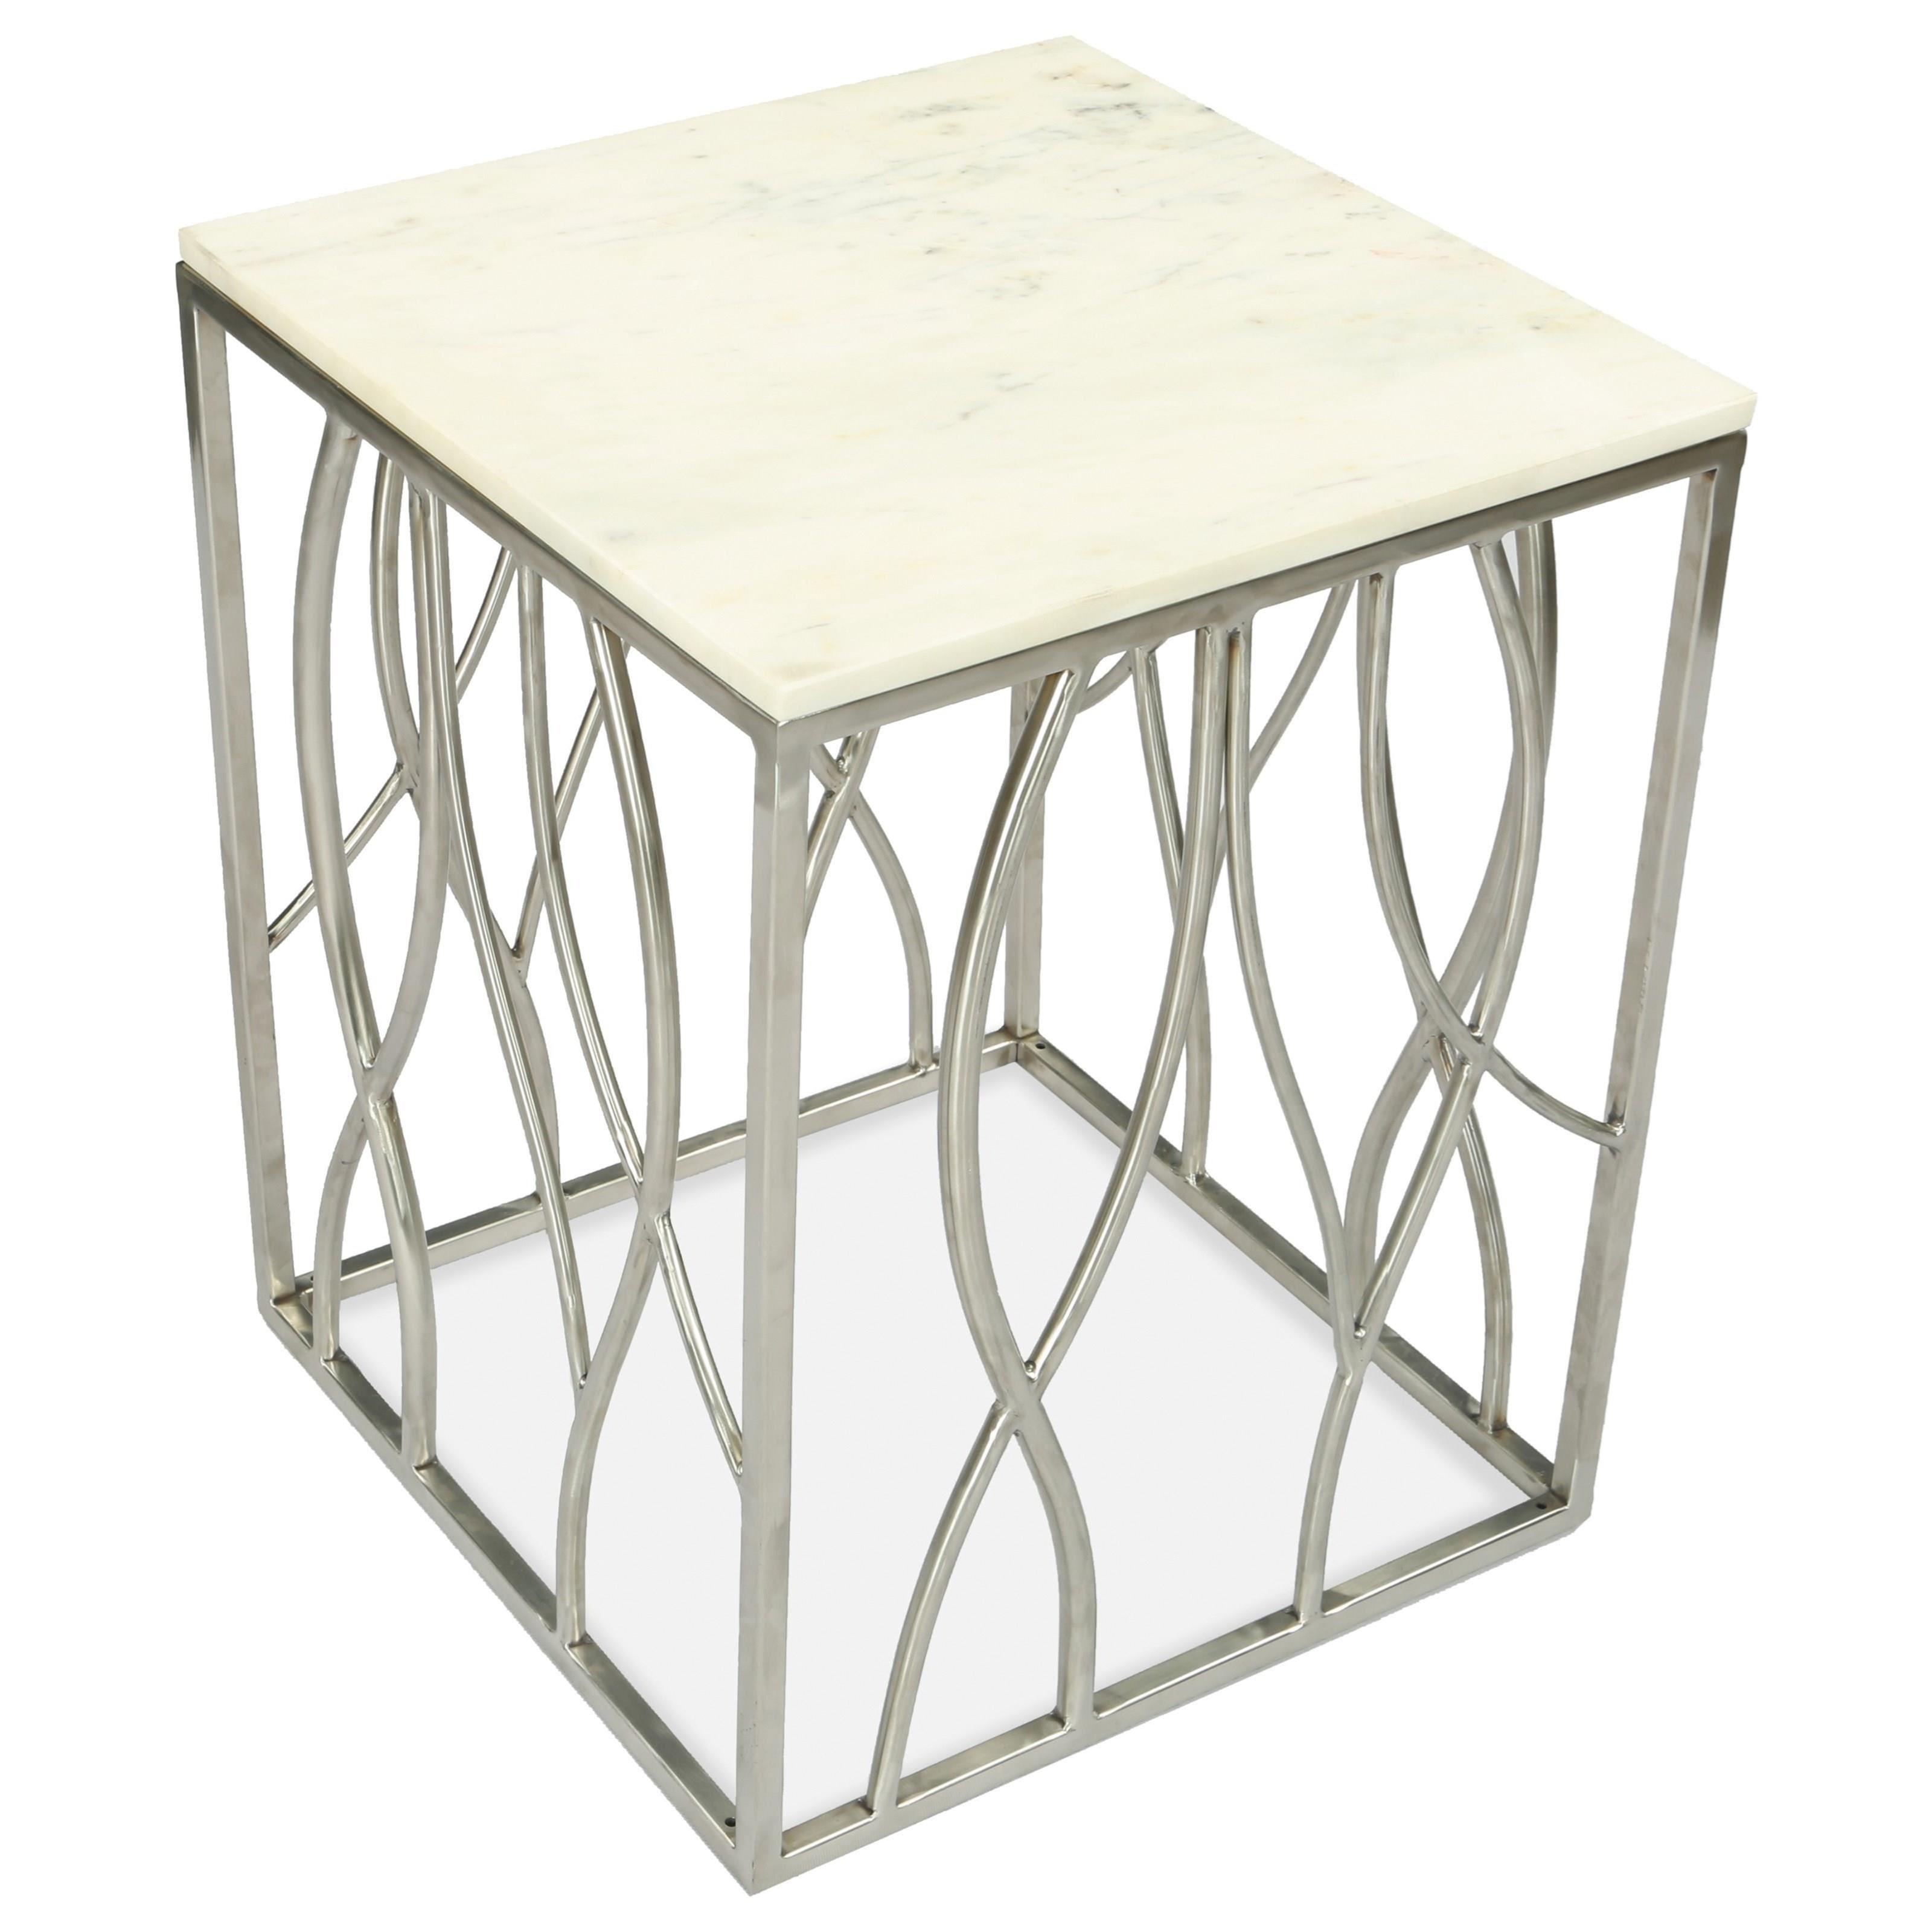 Ulysses Square End Table by Riverside Furniture at Darvin Furniture